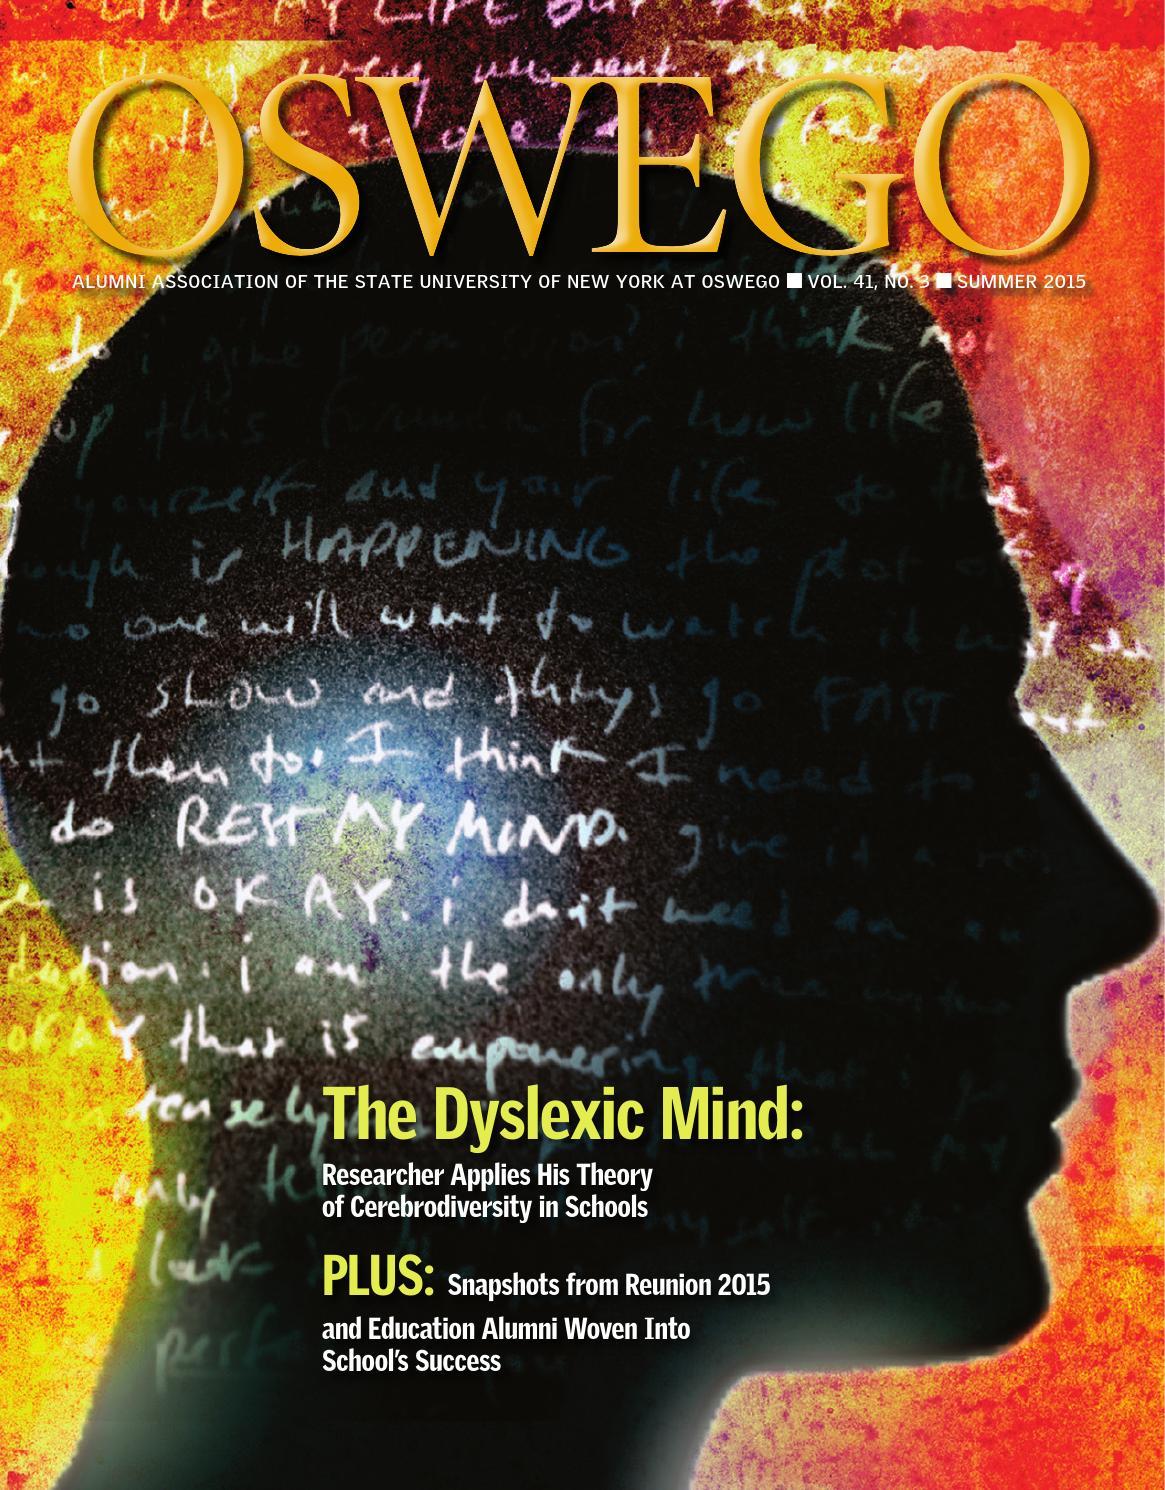 oswego alumni magazine summer 2015 by oswego alumni association oswego alumni magazine summer 2015 by oswego alumni association issuu